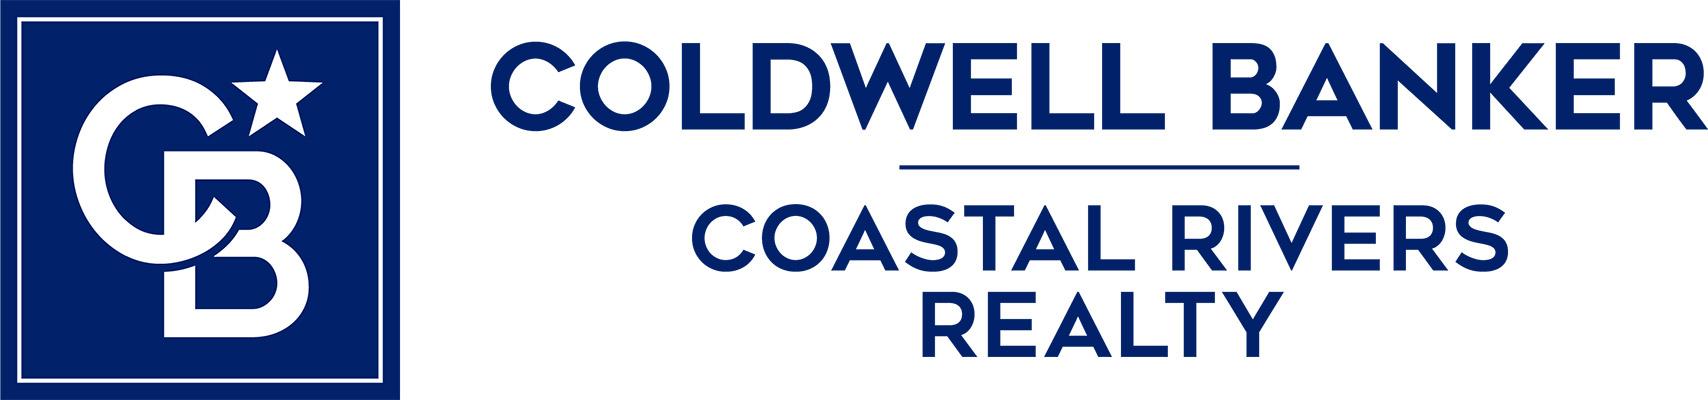 Coldwell Banker Coastal Rivers Logo